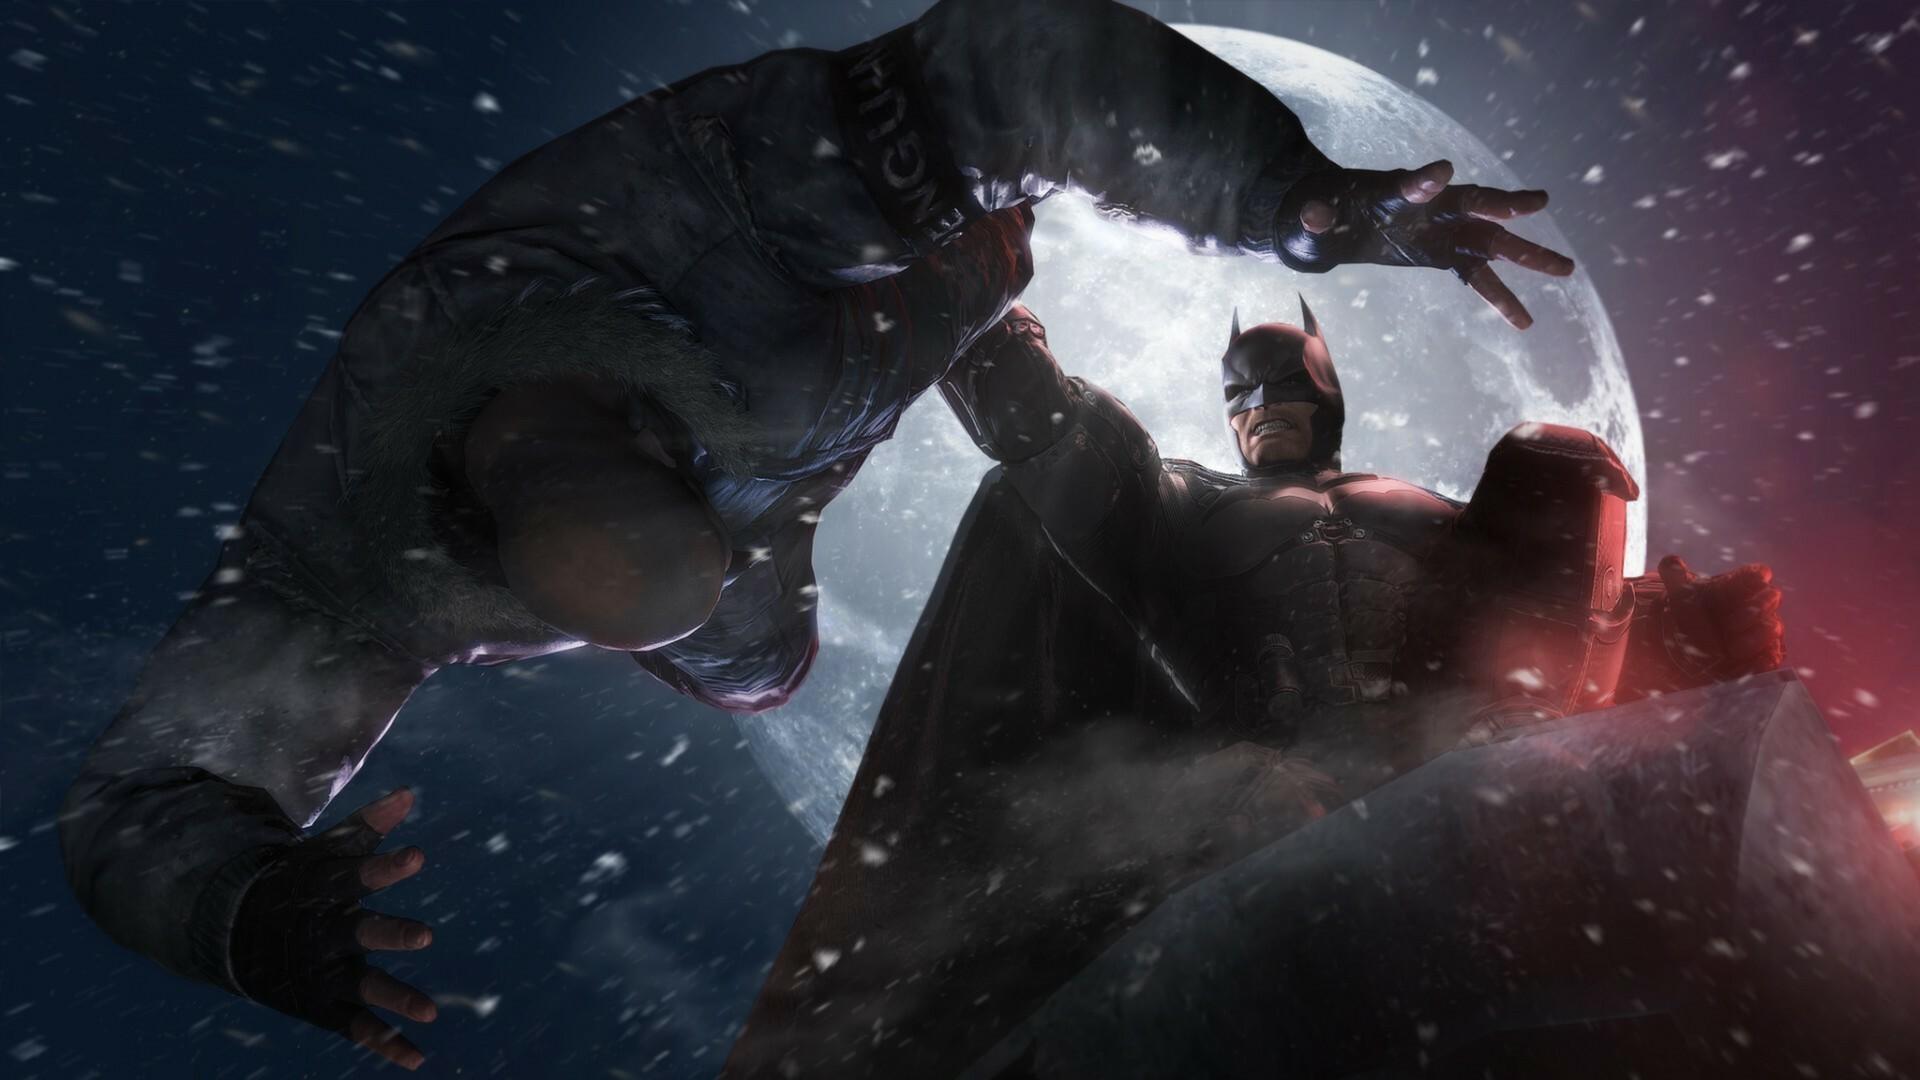 batman-arkham-origins-complete-edition-pc-screenshot-02